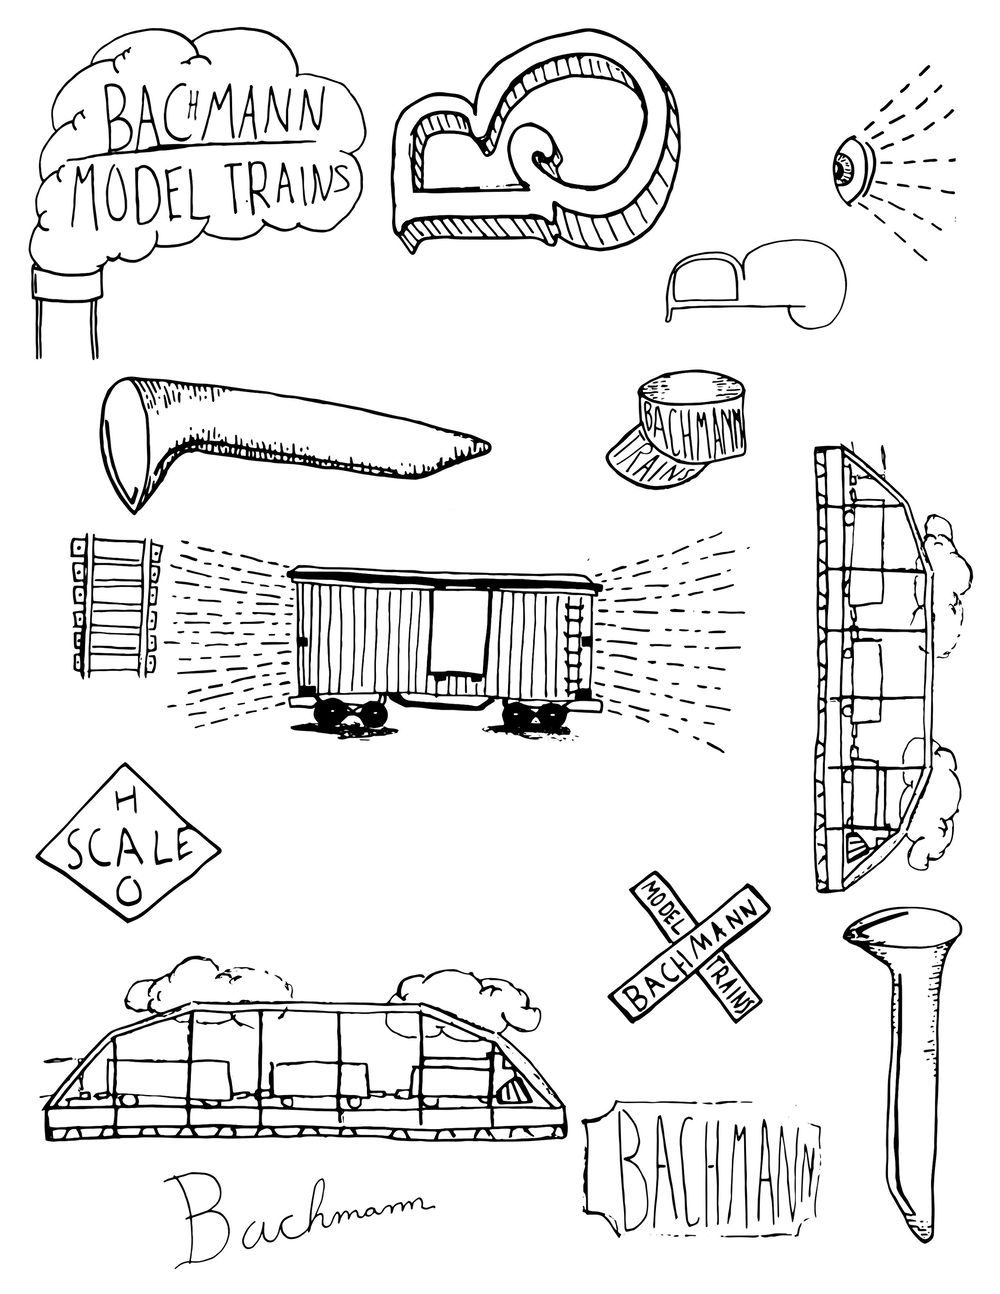 Bachmann Model Trains: Label Design  - image 2 - student project